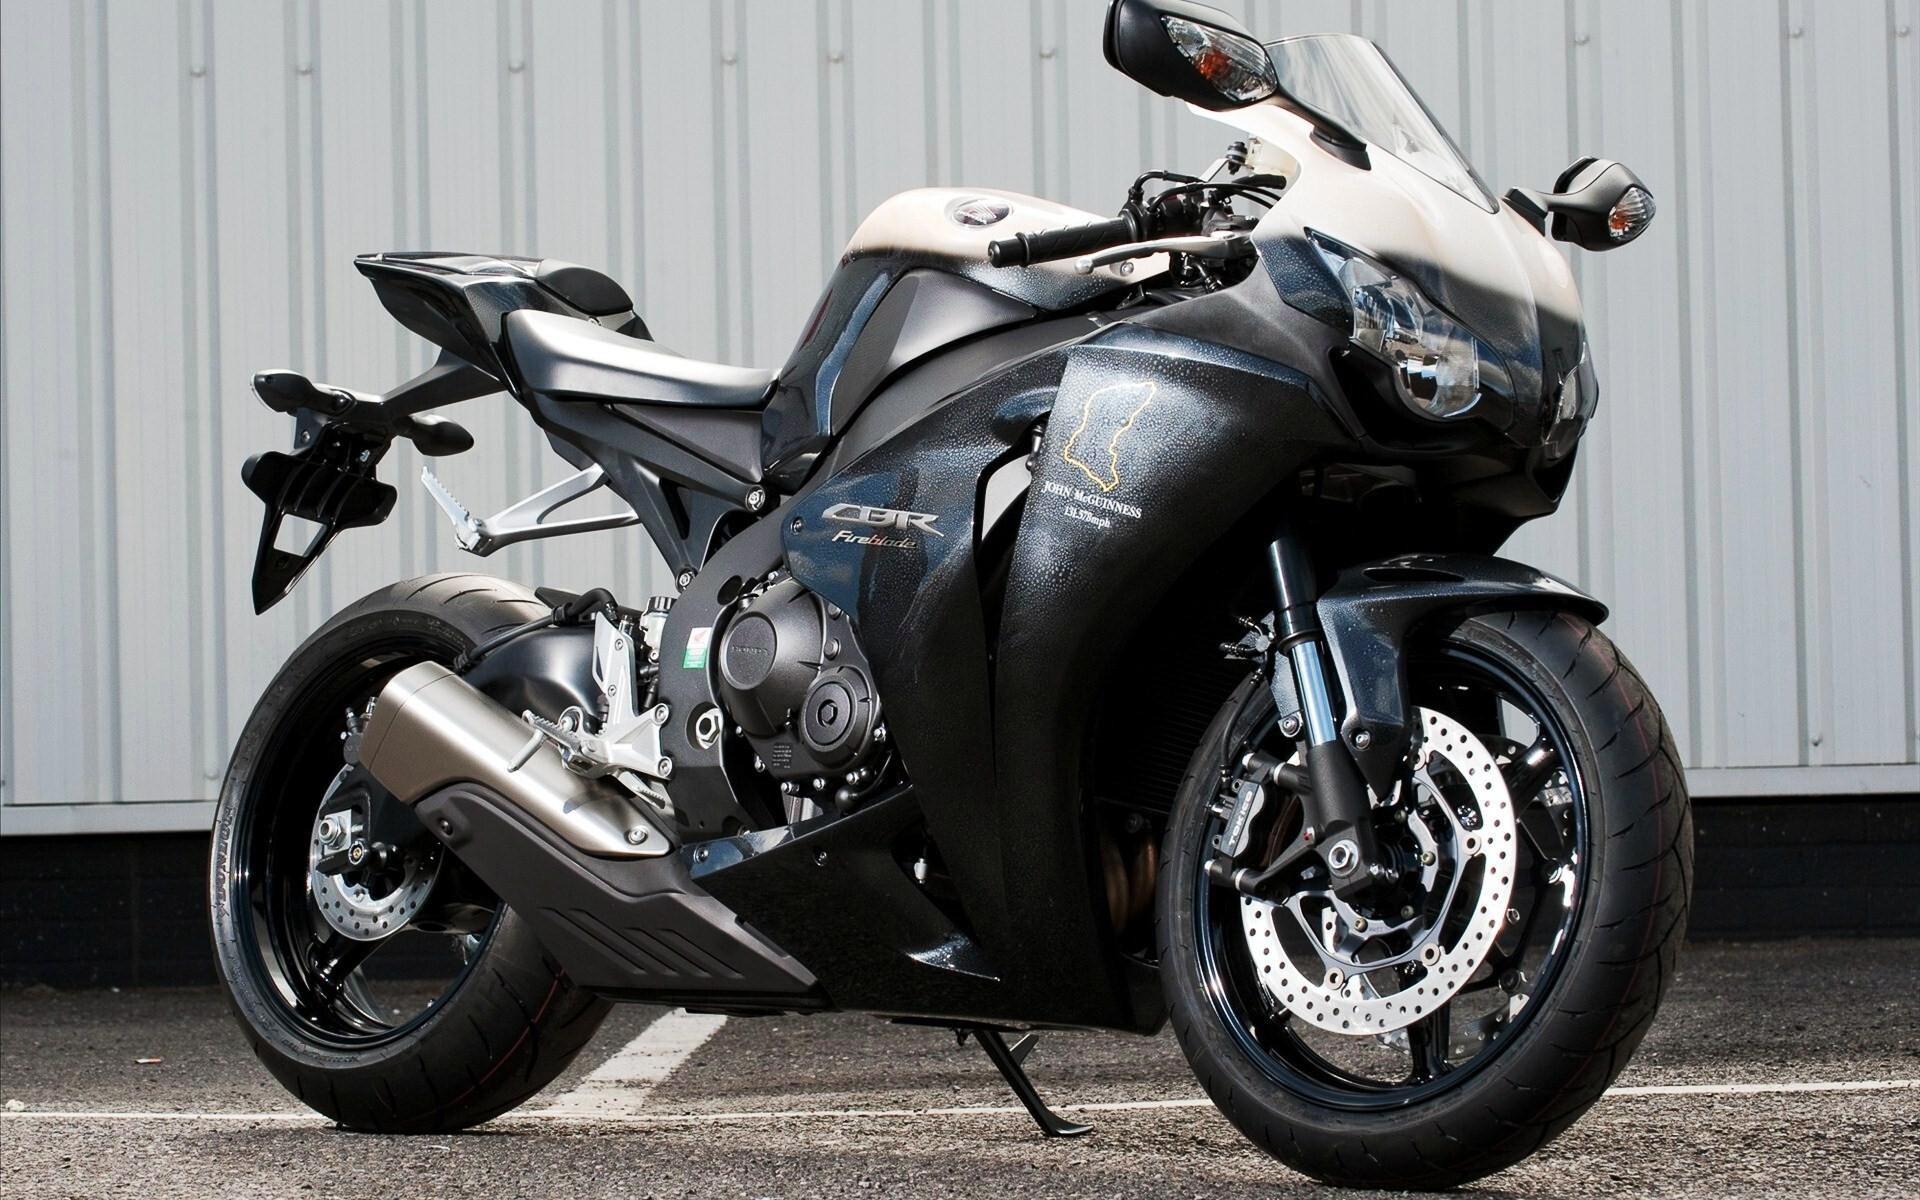 Honda Sport Cbr 100 New Bike Hd Wallpapers Hd Wallpapers